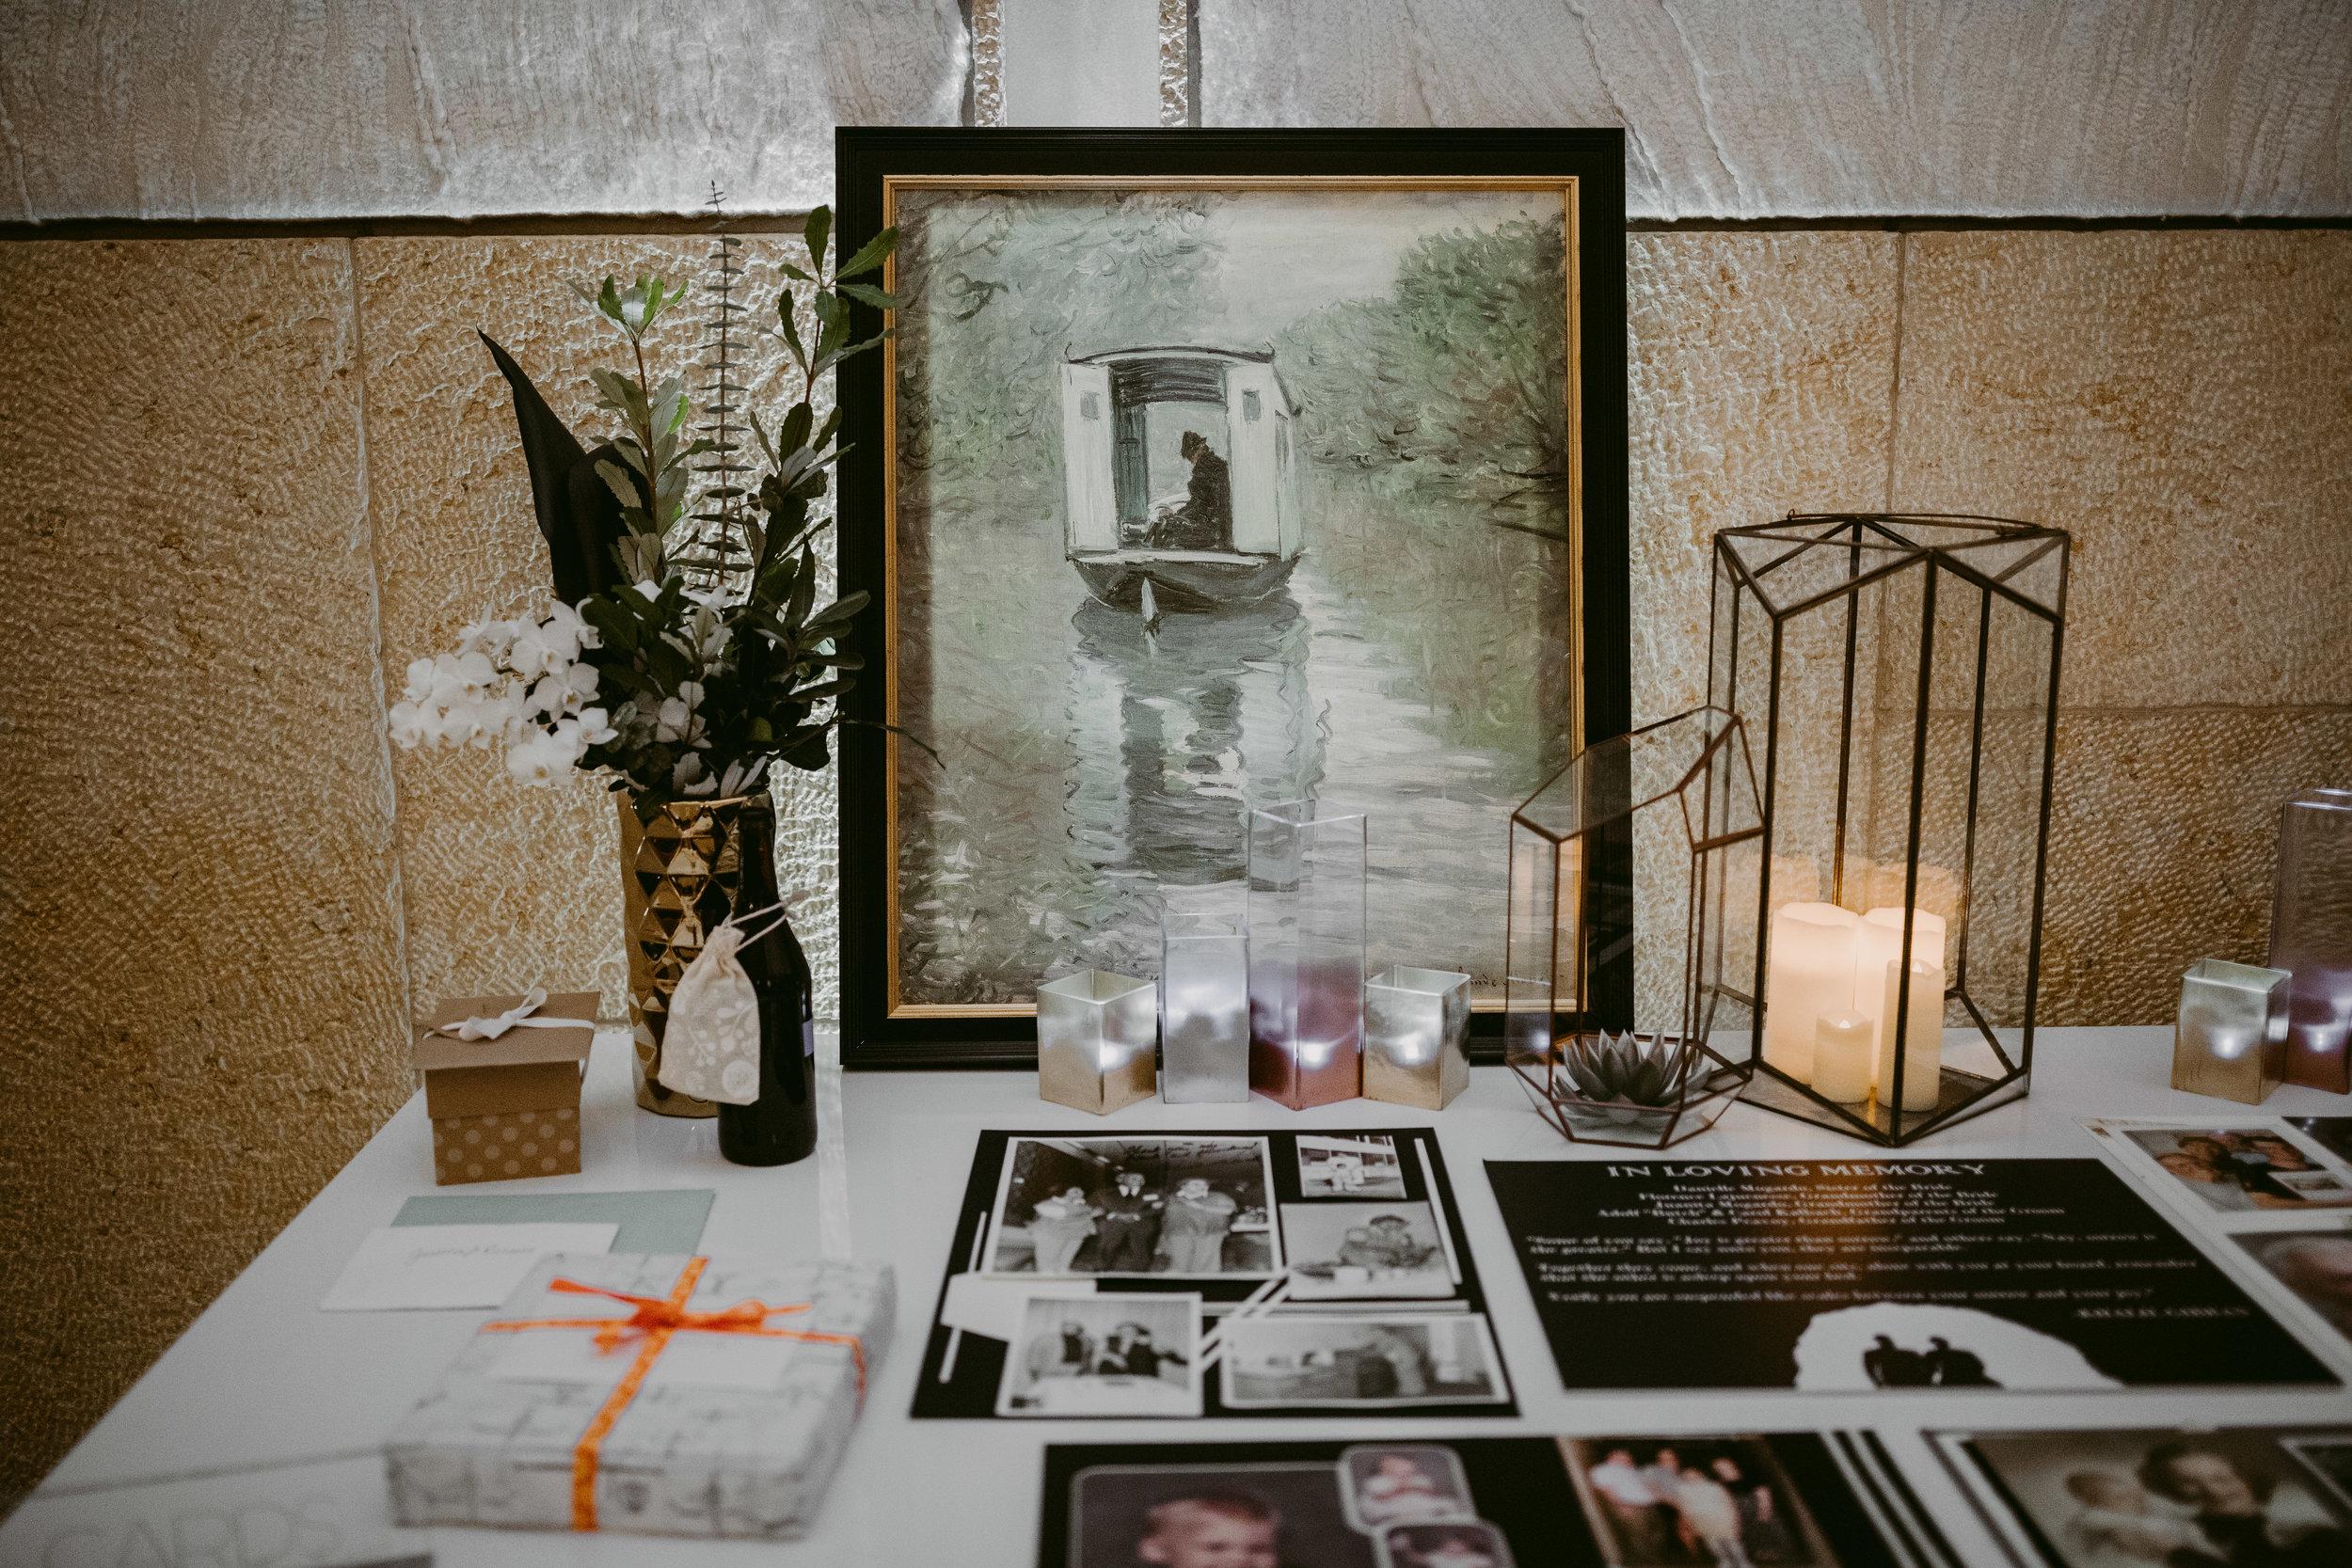 JessicaandRussell-OctoberWedding2017-4(125of144).jpg